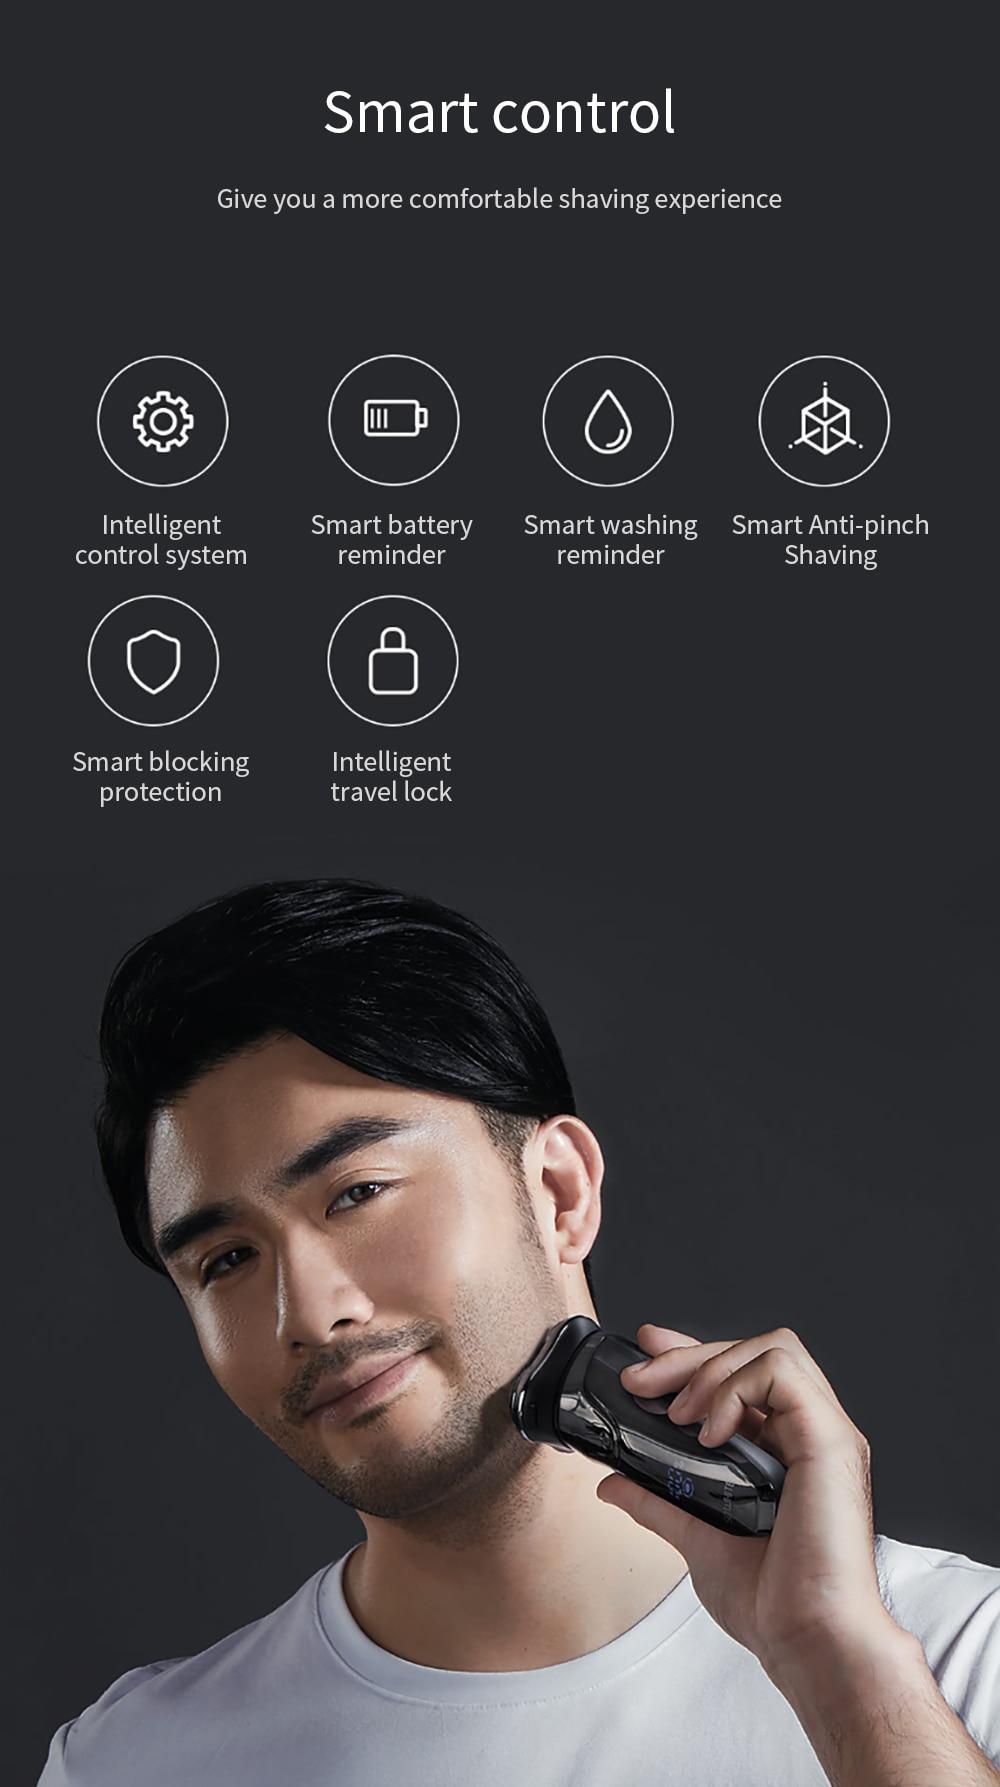 SOOCAS SO WHITE ES3 USB Rechargeable Electric Shaver xiaomi razor 3 head Electric Razor for men beard trimmer shaving machine 2